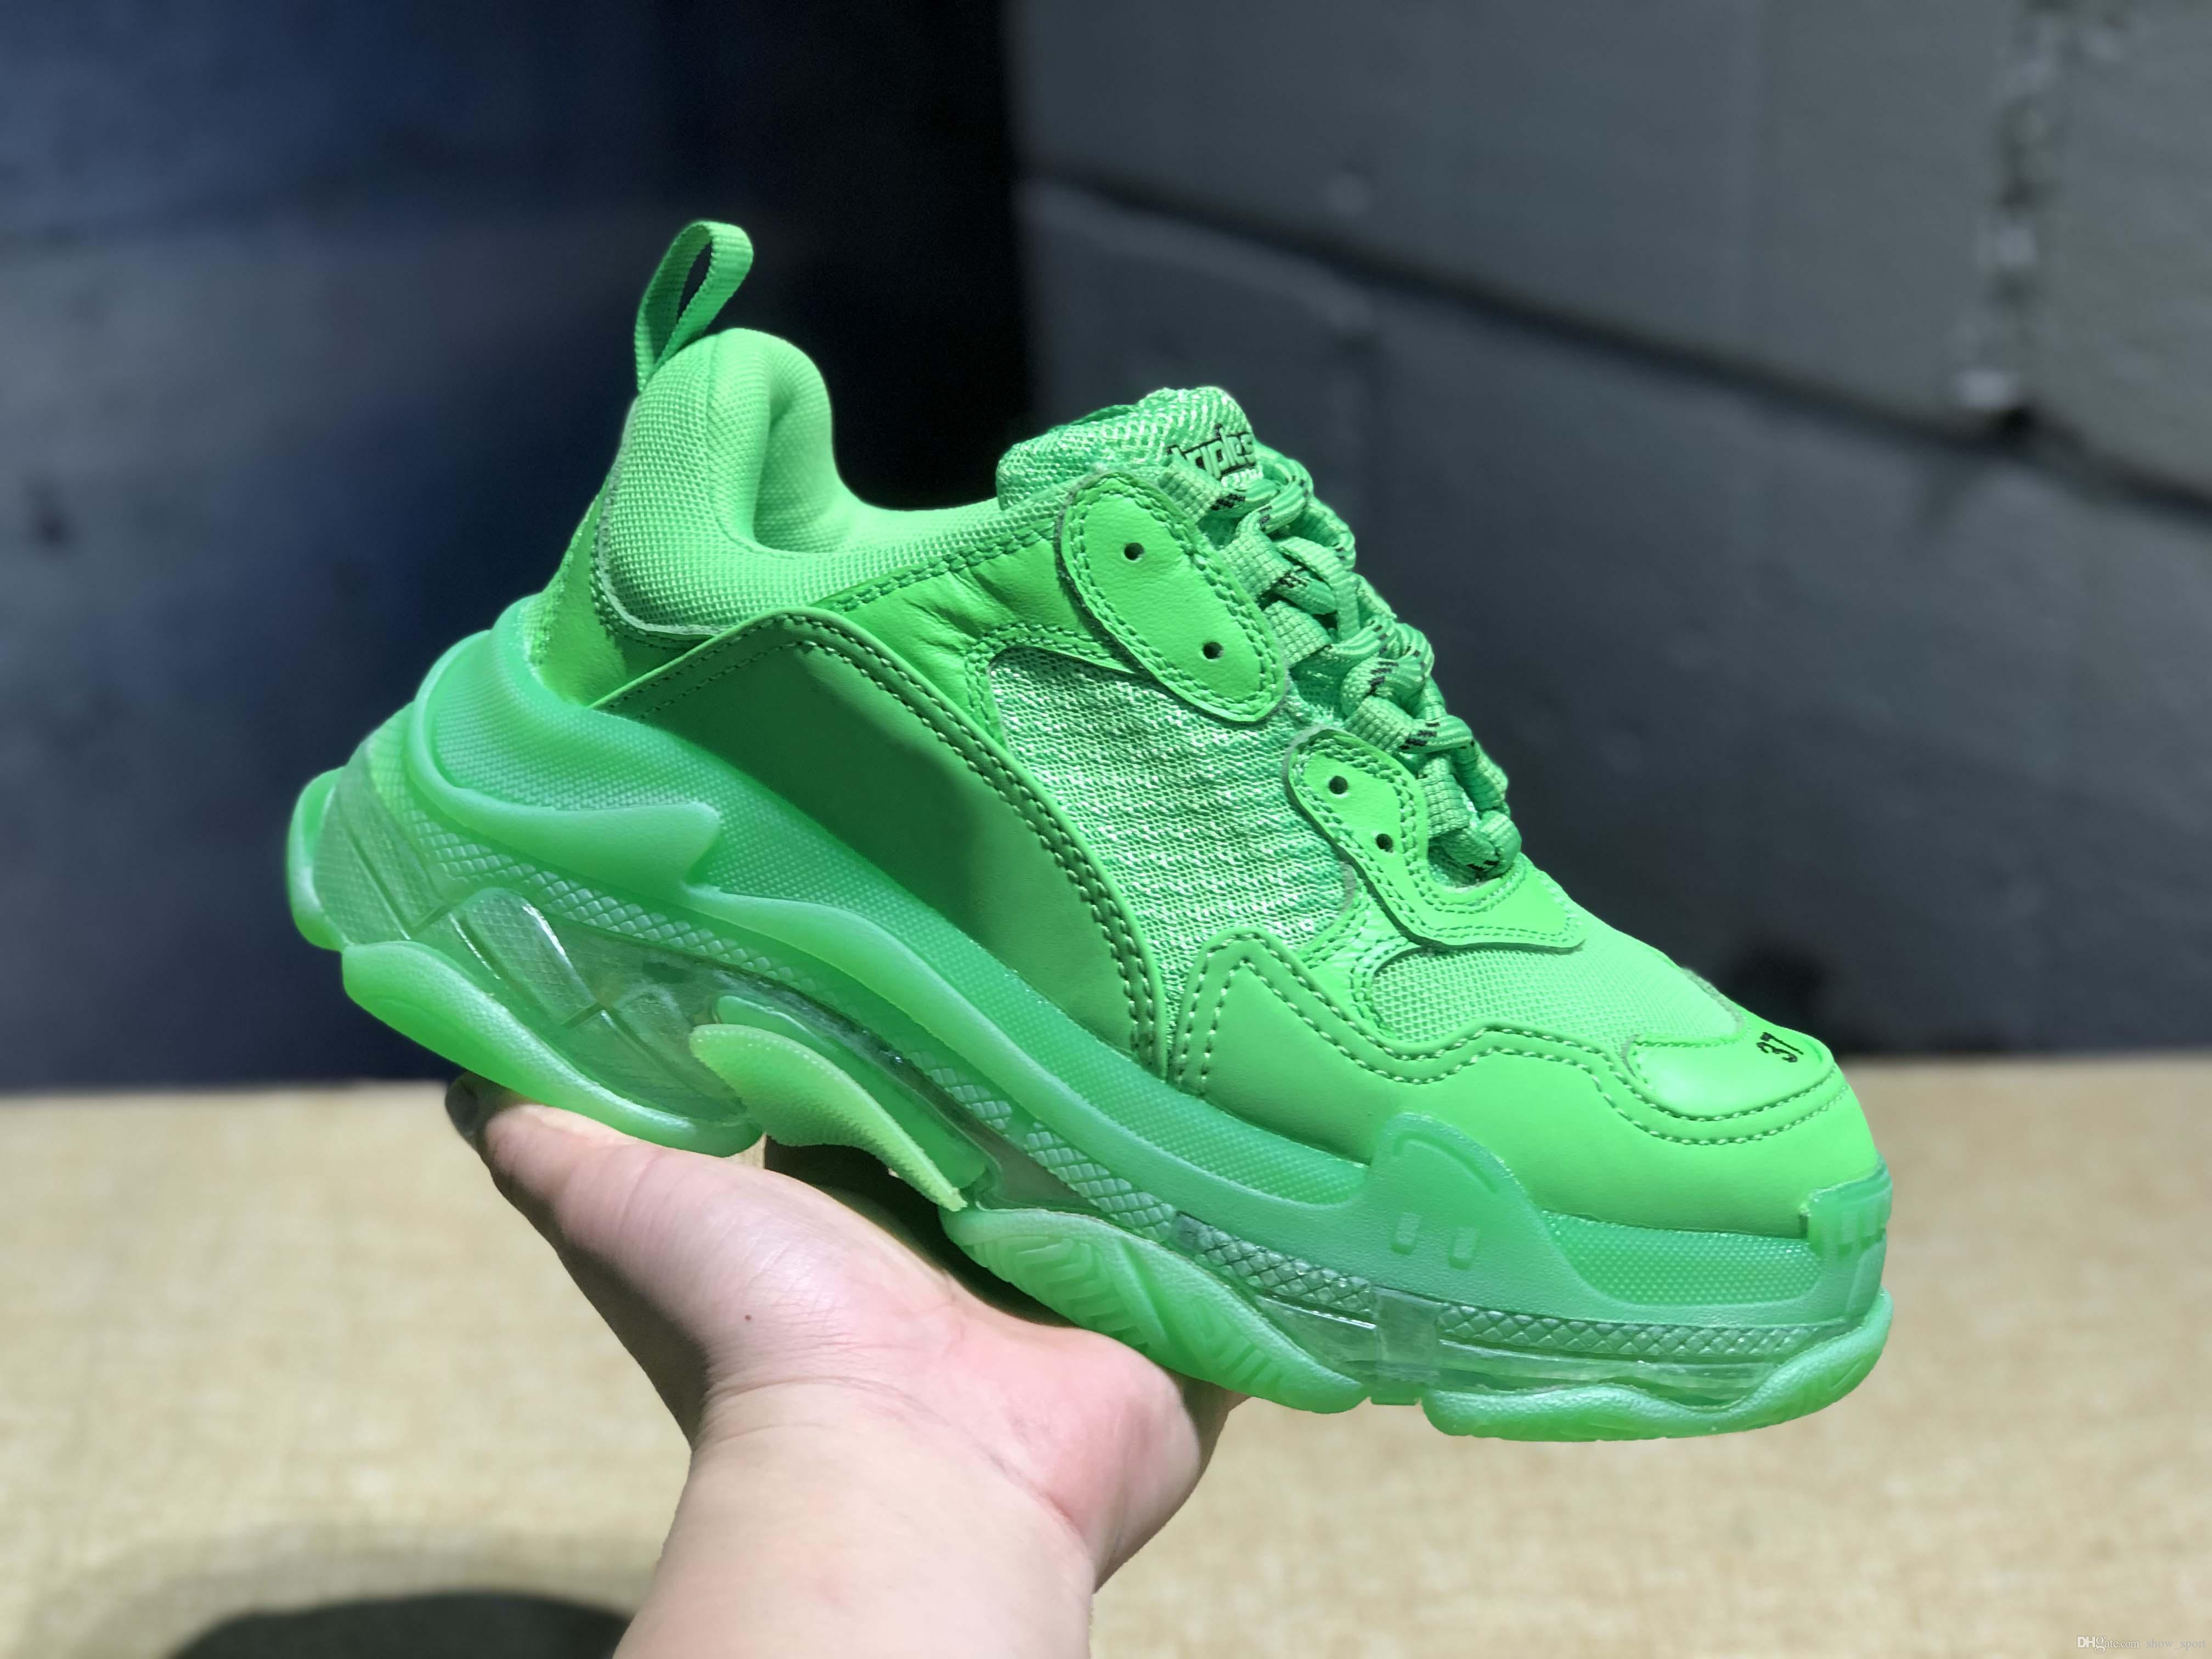 e5b57413432271 2019 New Colors BL Triple S Green Retros Paris Sneakers Mens Women Designer  Shoes Fashion Outdoor Old Grandpa Luxury Trainers 35 45 Shoe Sale Shoes Uk  From ...